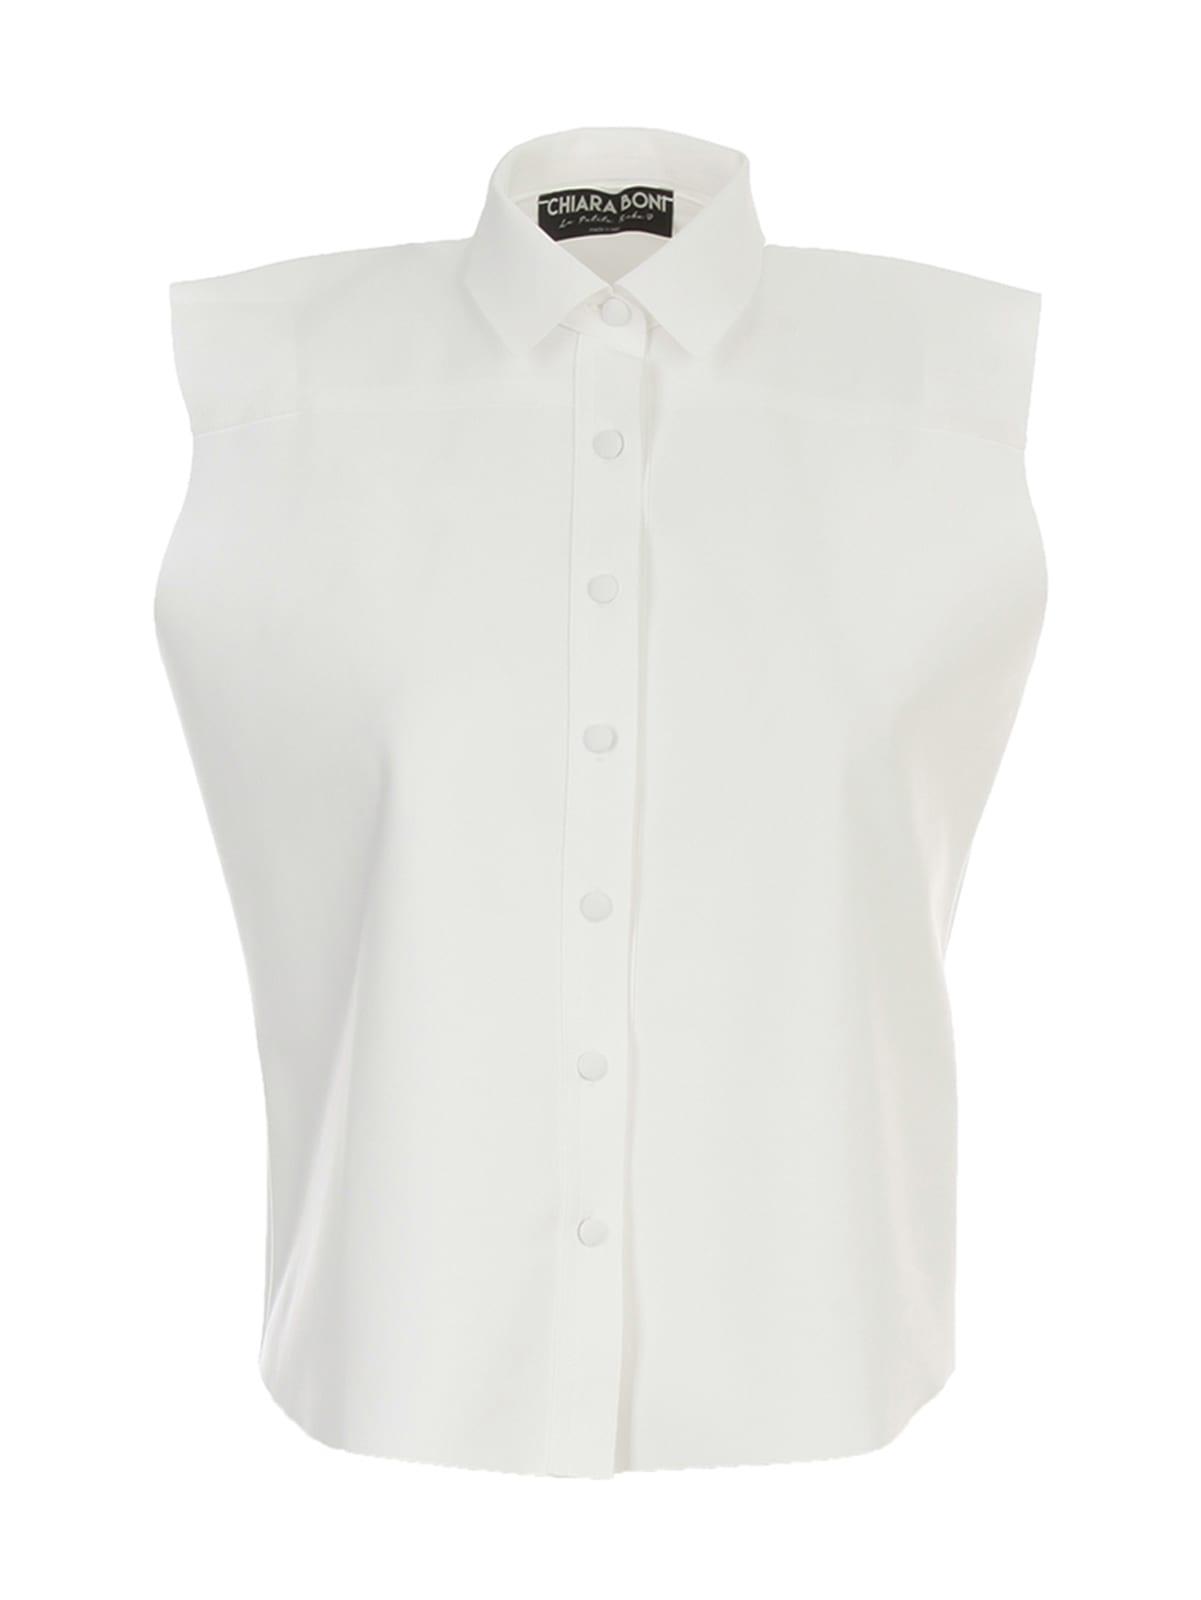 Short Sleeveless Shirt